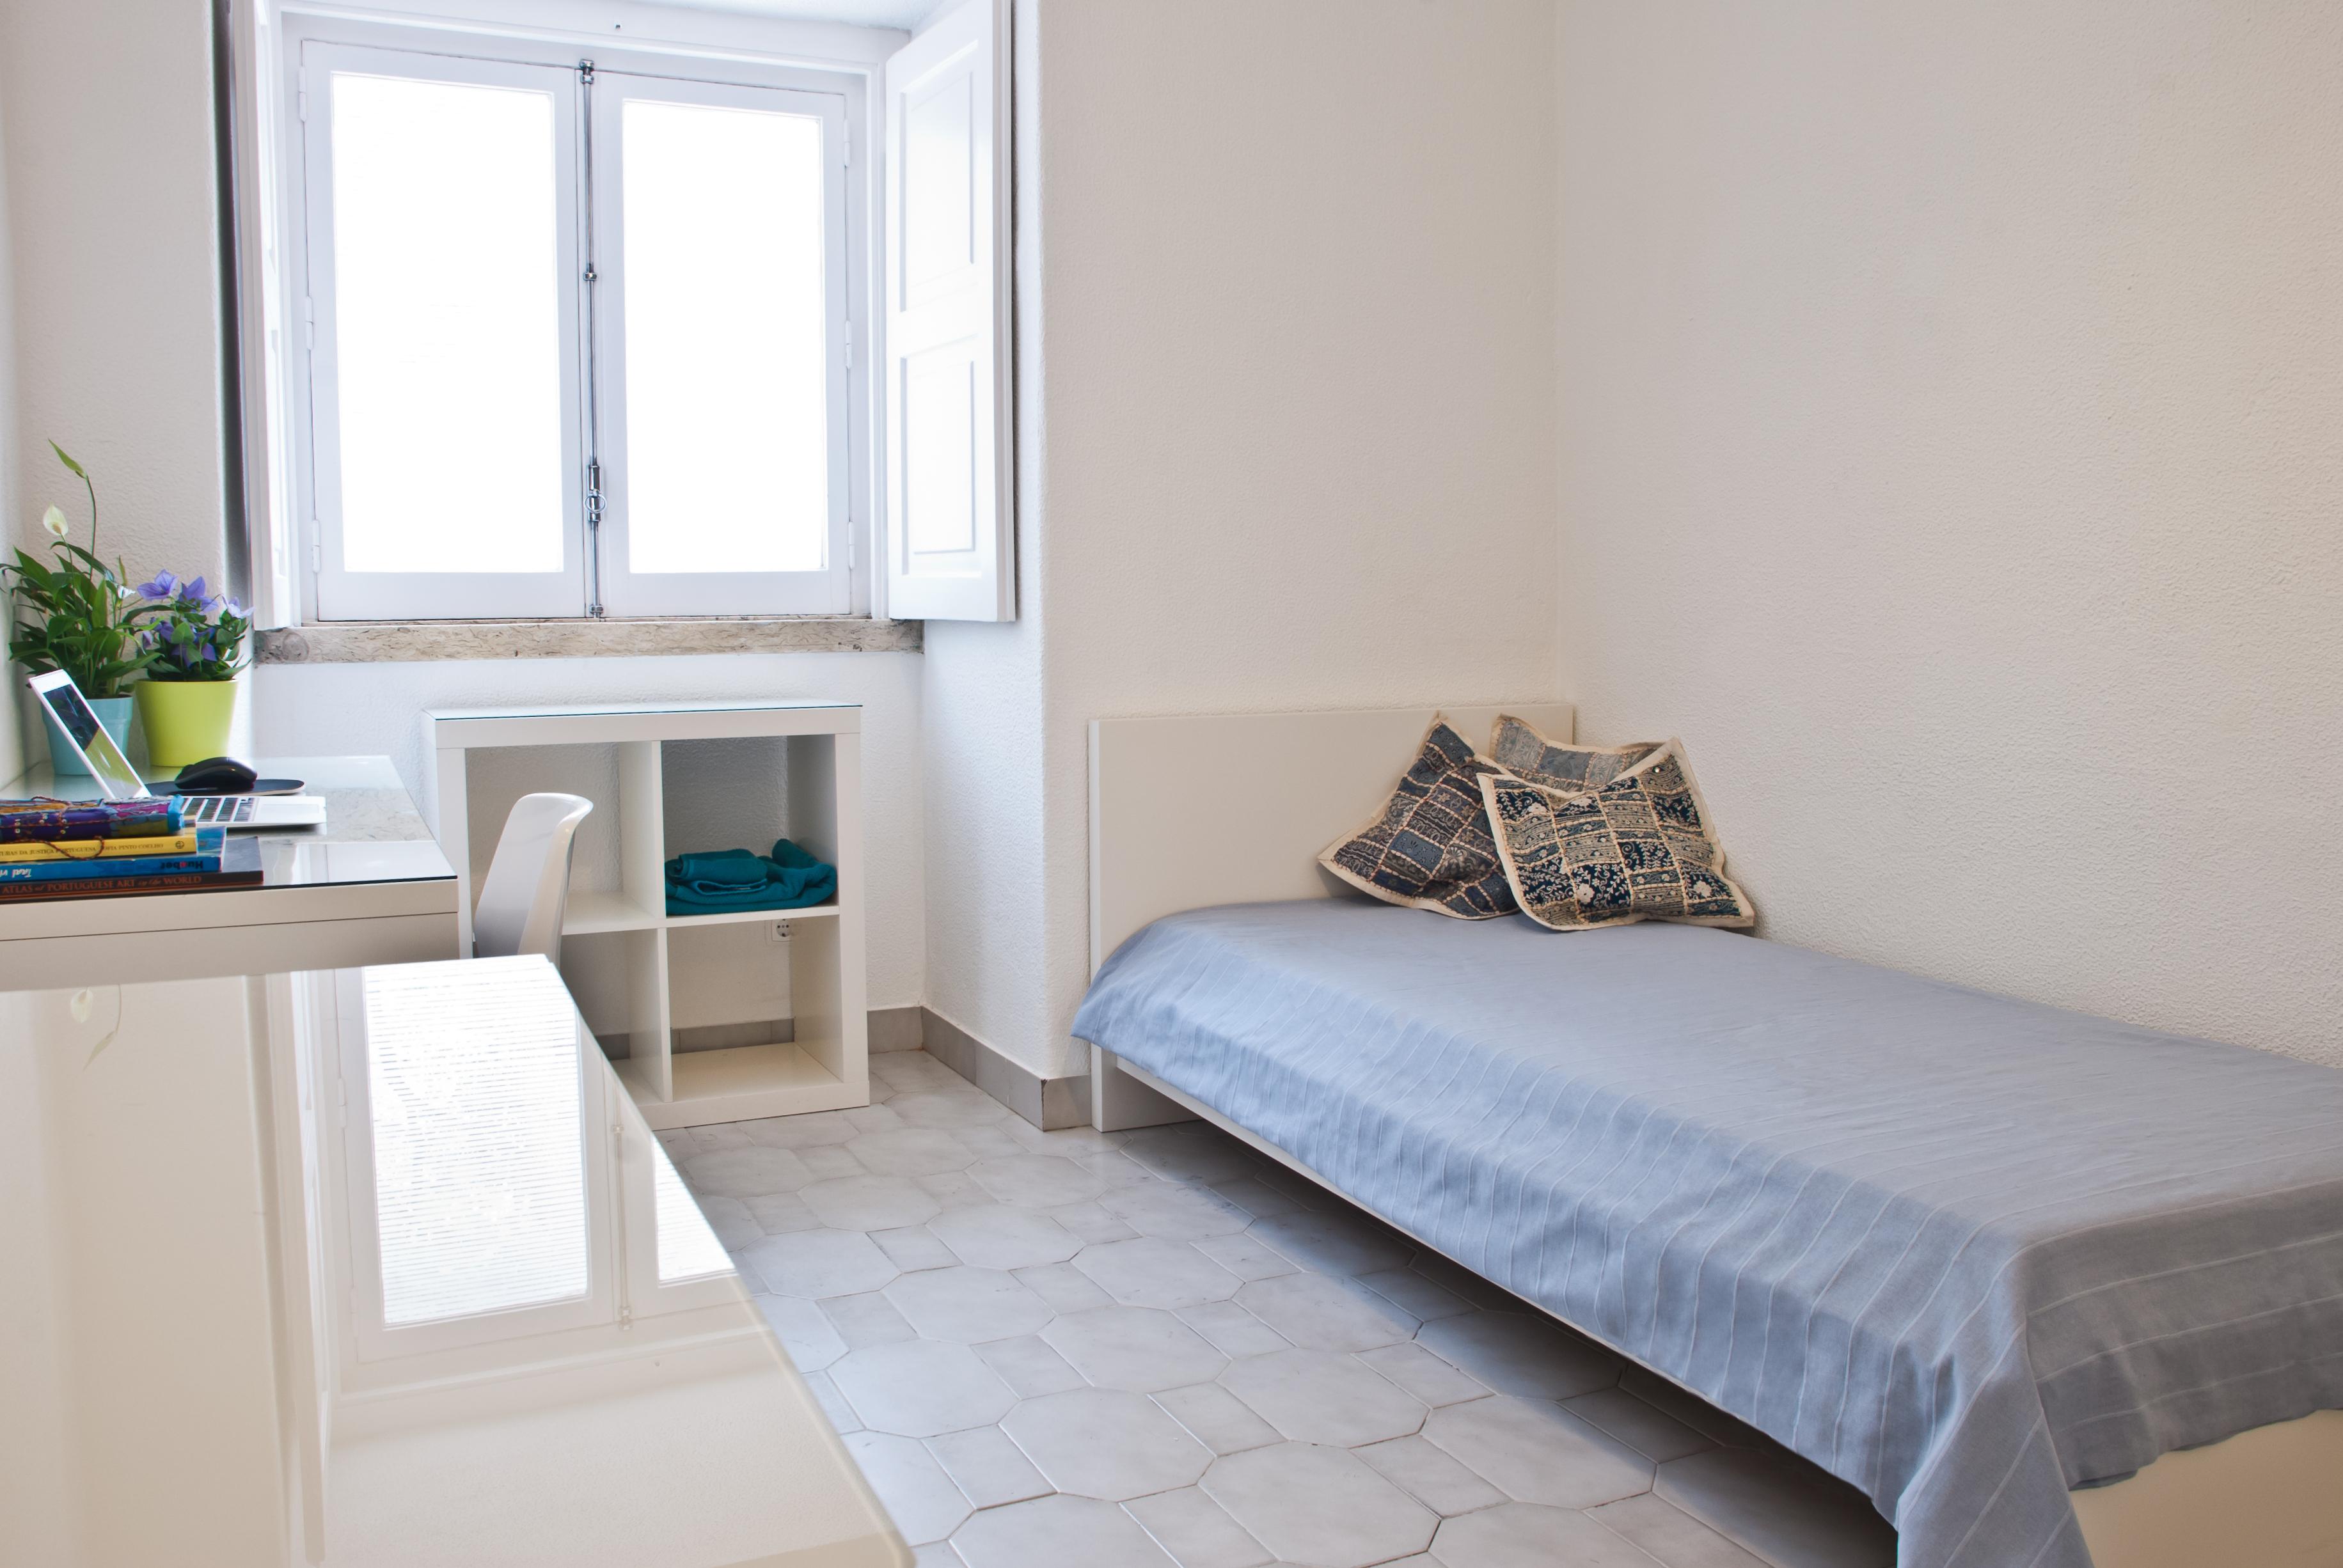 GJ_-_Quarto.Room_nº3_-_Foto_2.jpg